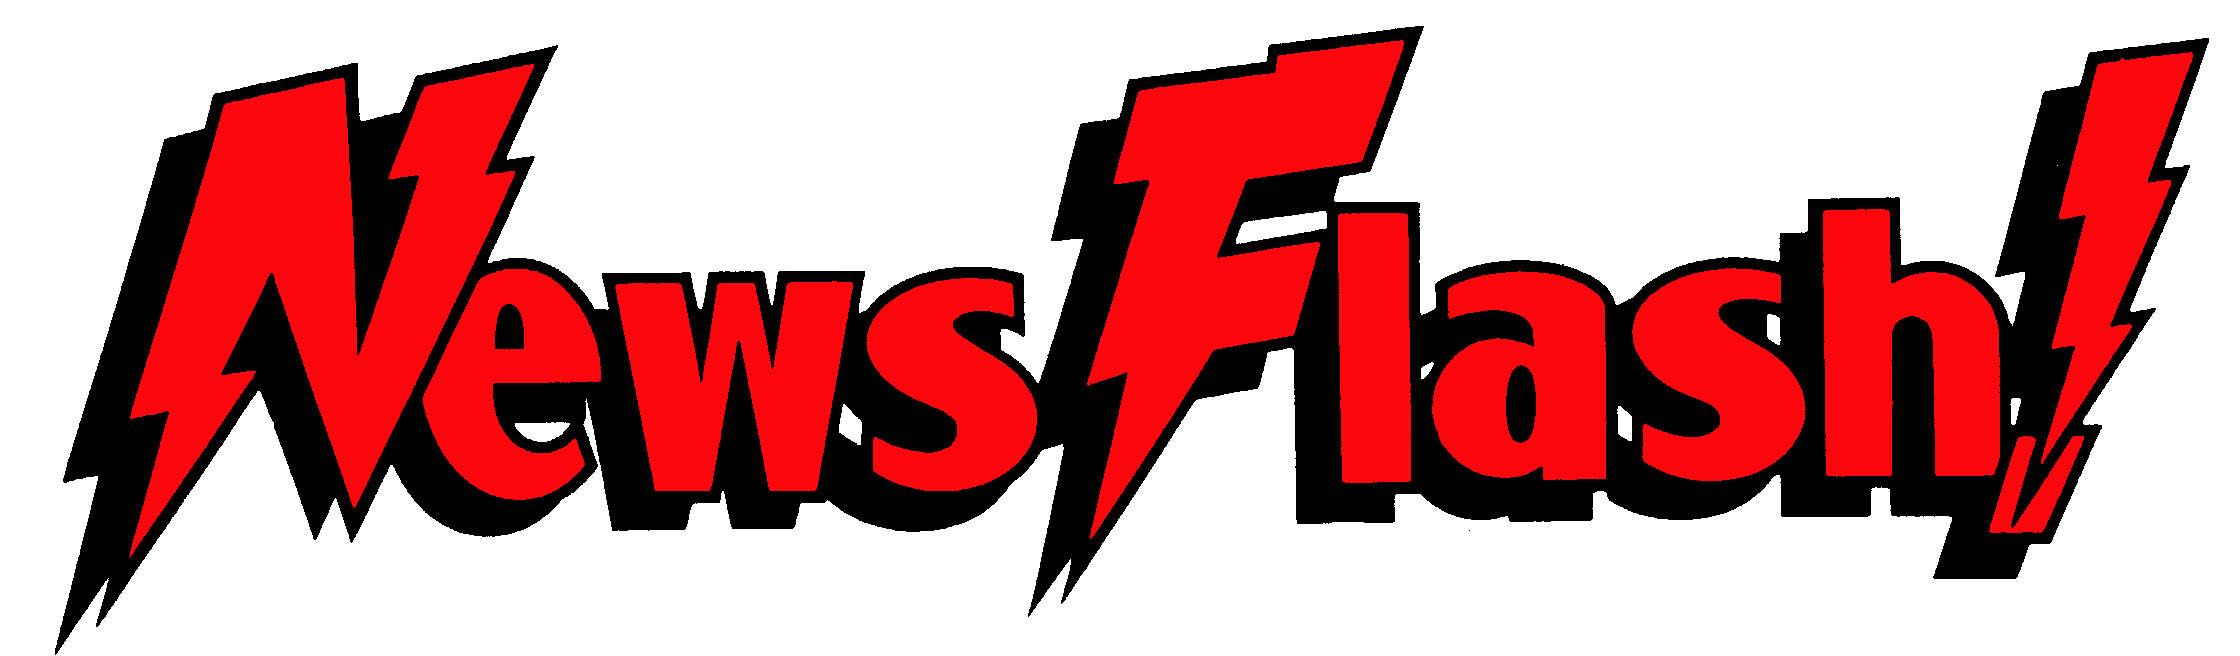 The flash news